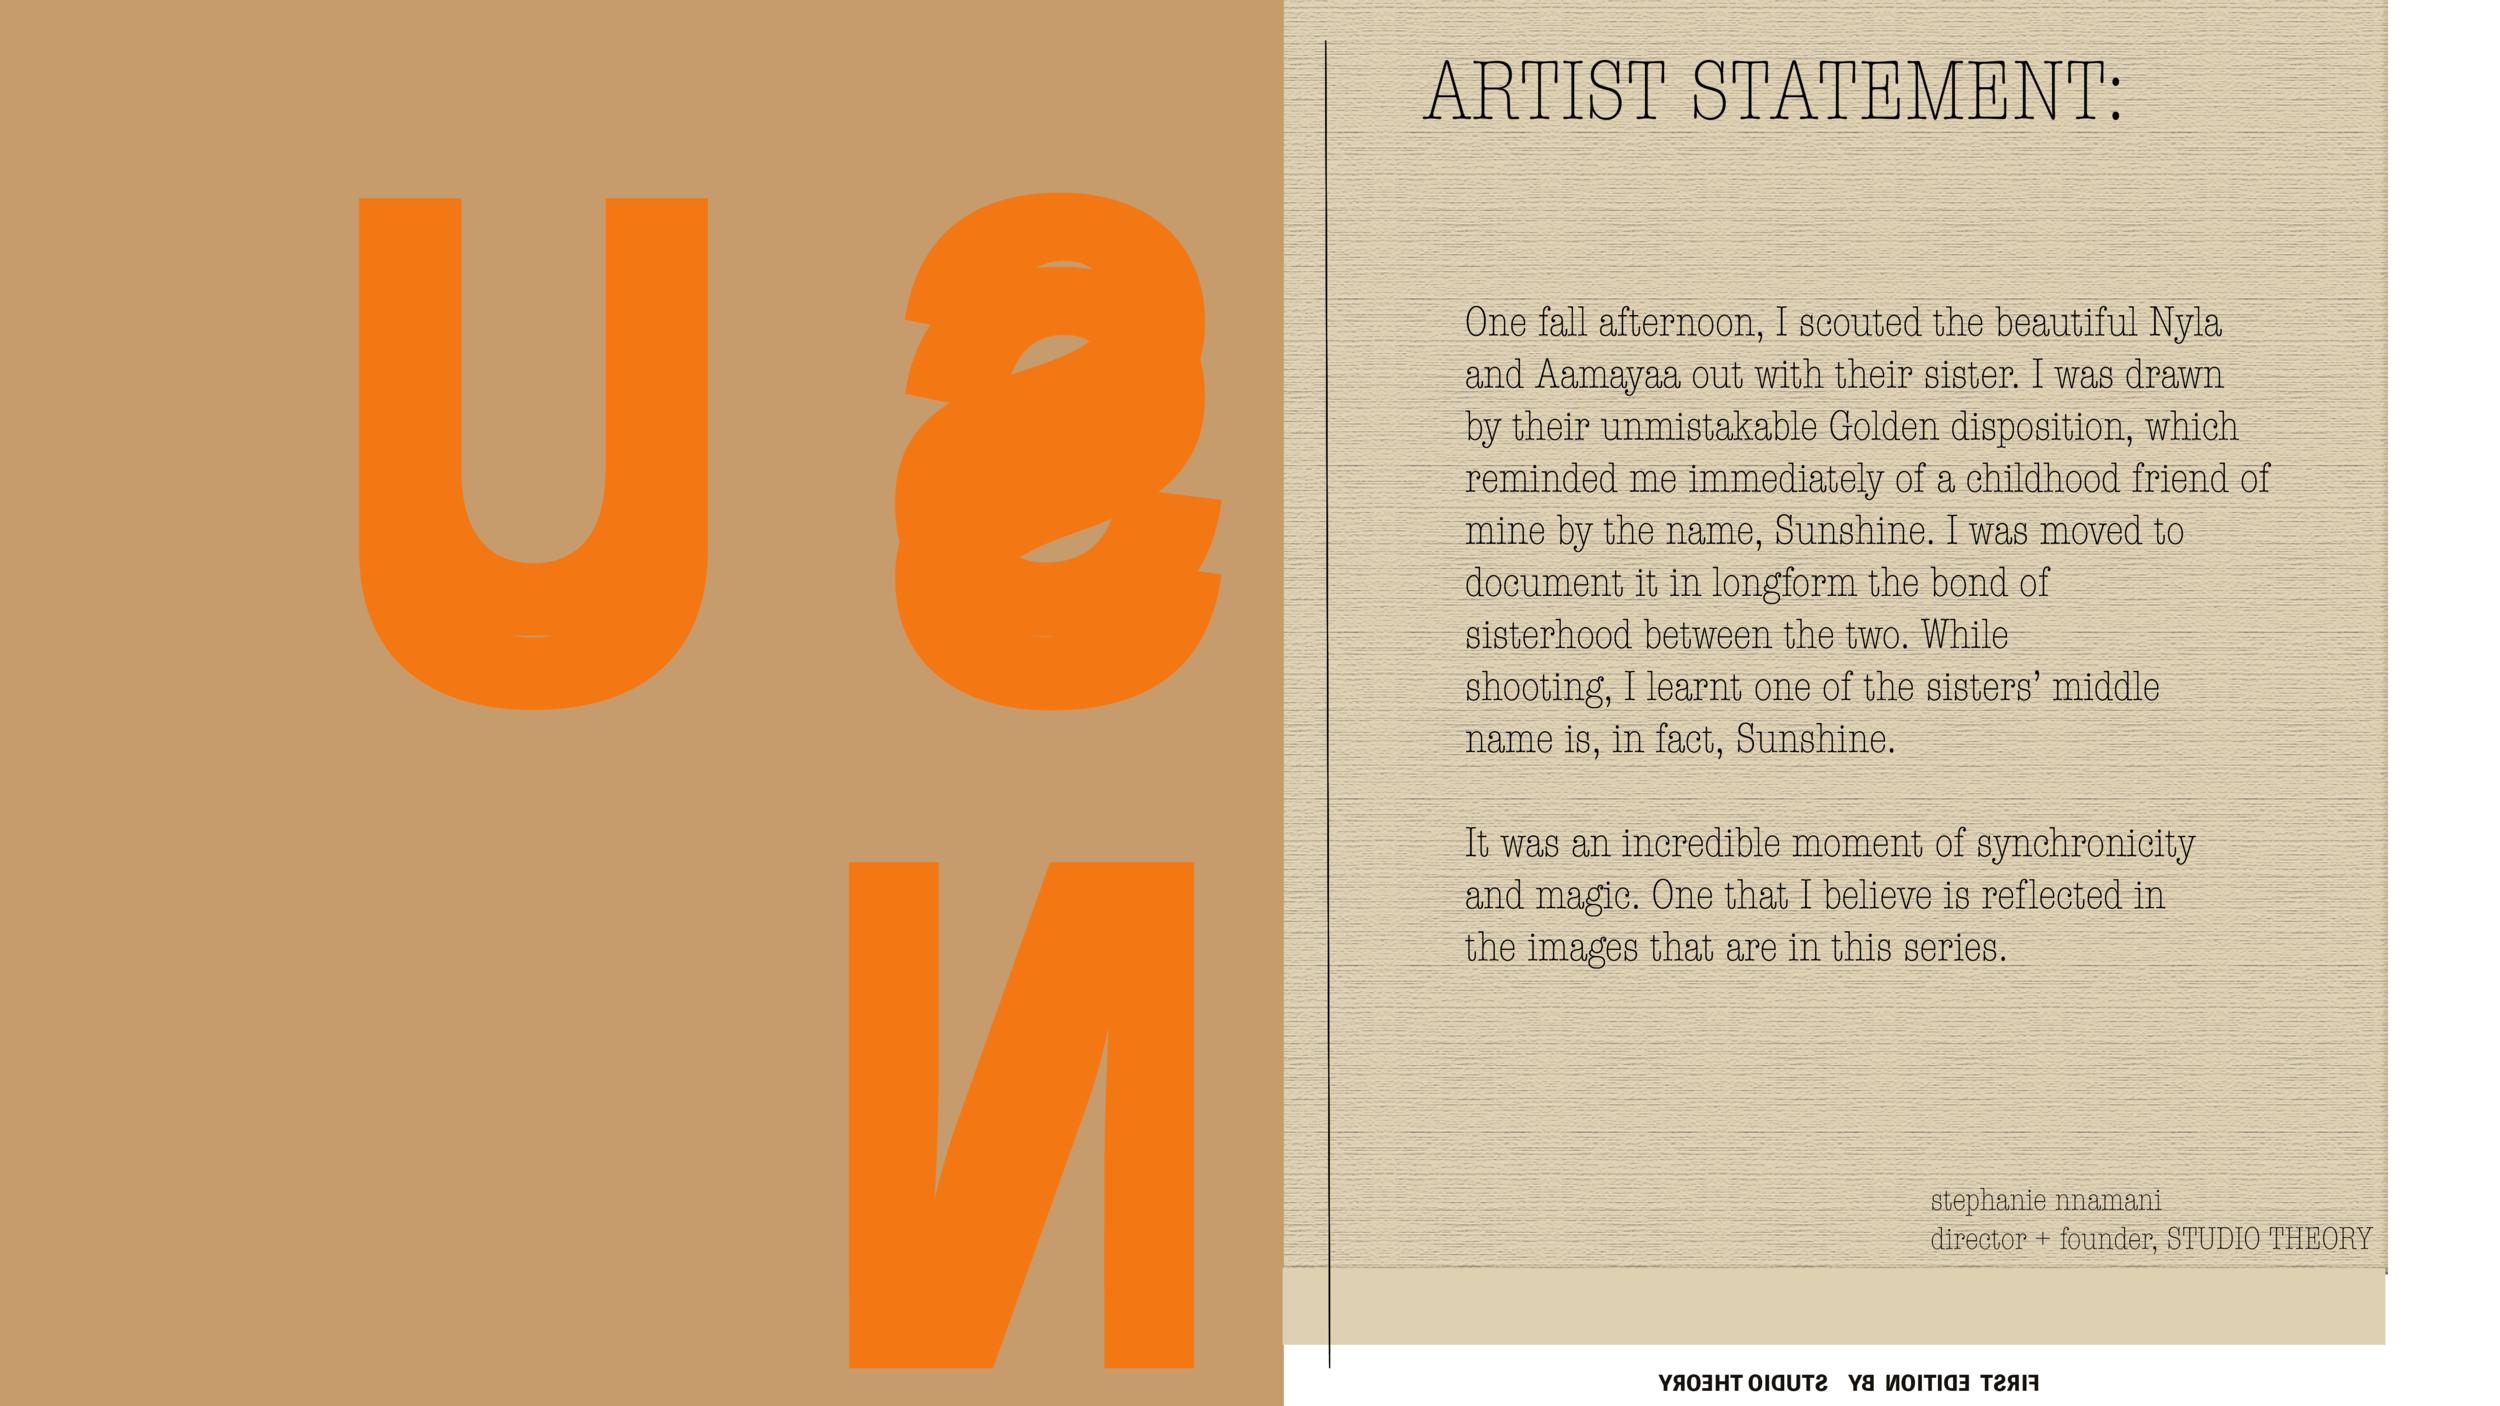 SOTS ARTIST STATEMENT 001.png